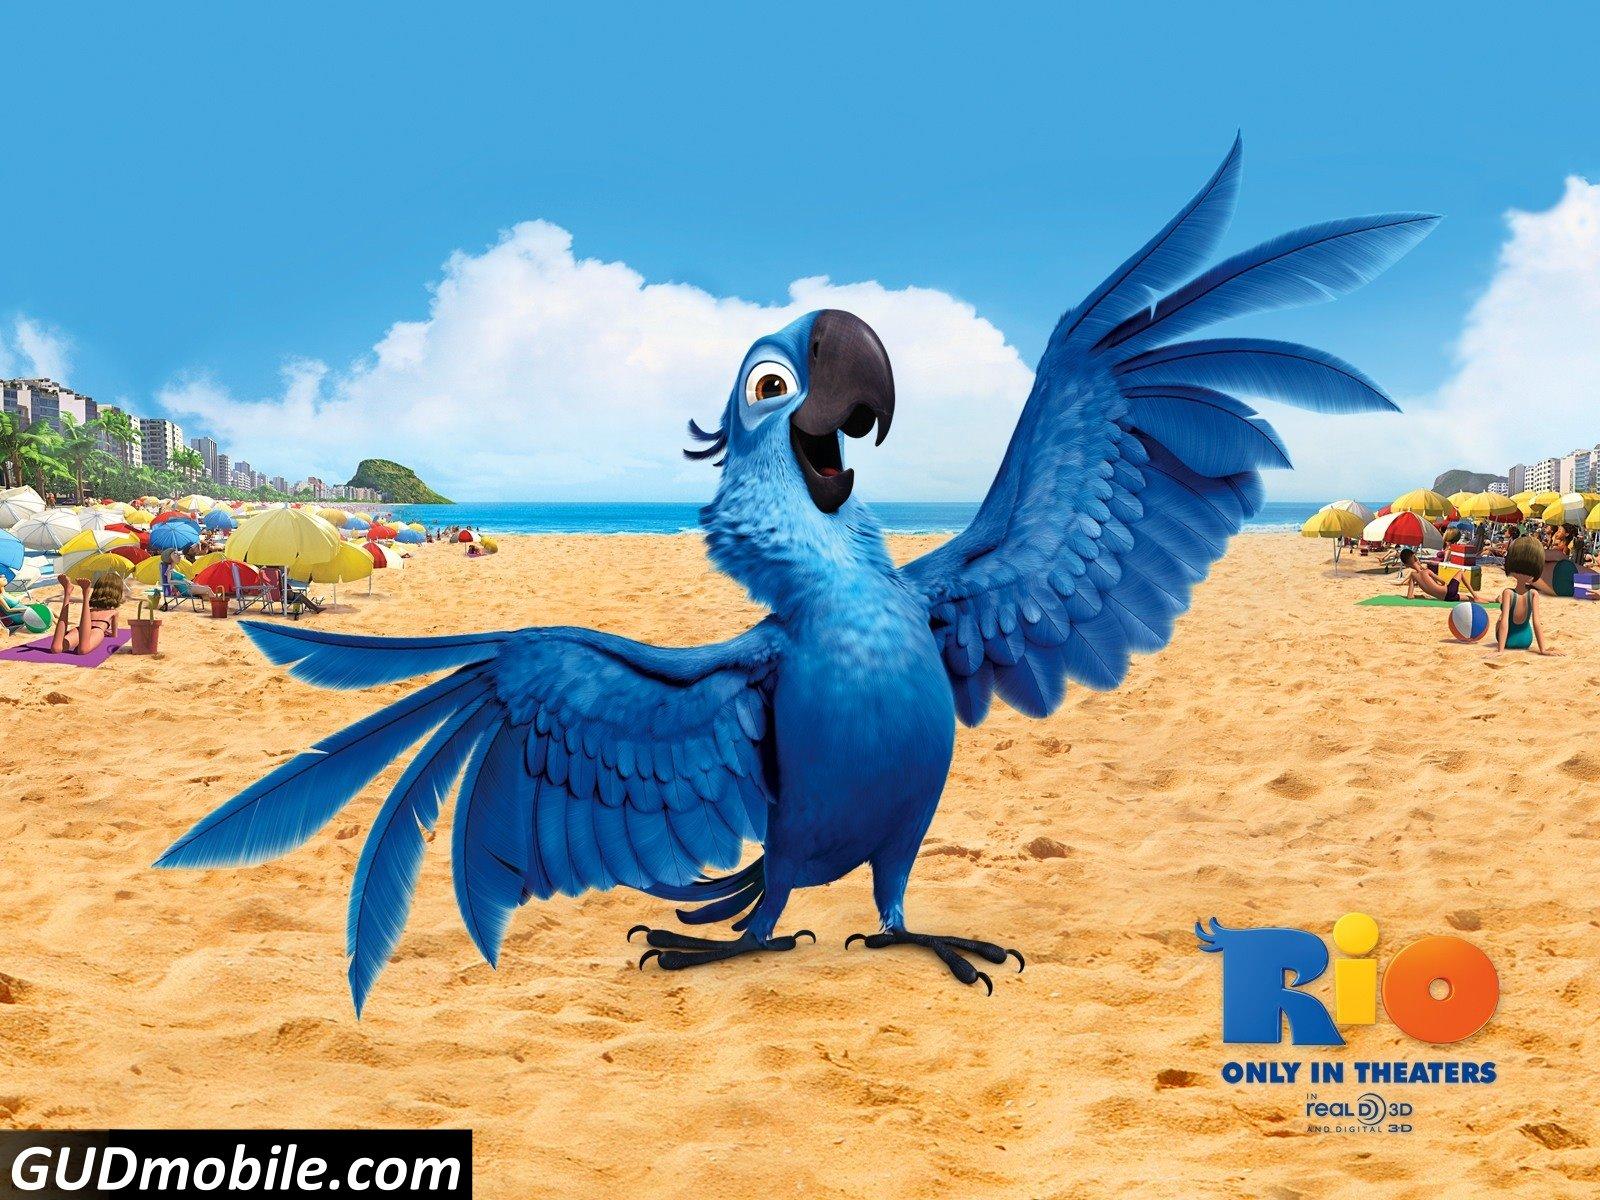 http://3.bp.blogspot.com/-d_jjh7lXRs0/TbOKYXNDJWI/AAAAAAAADHI/H3xLfM8Z1Ow/s1600/blu_bird_in_rio-1600x1200.jpg